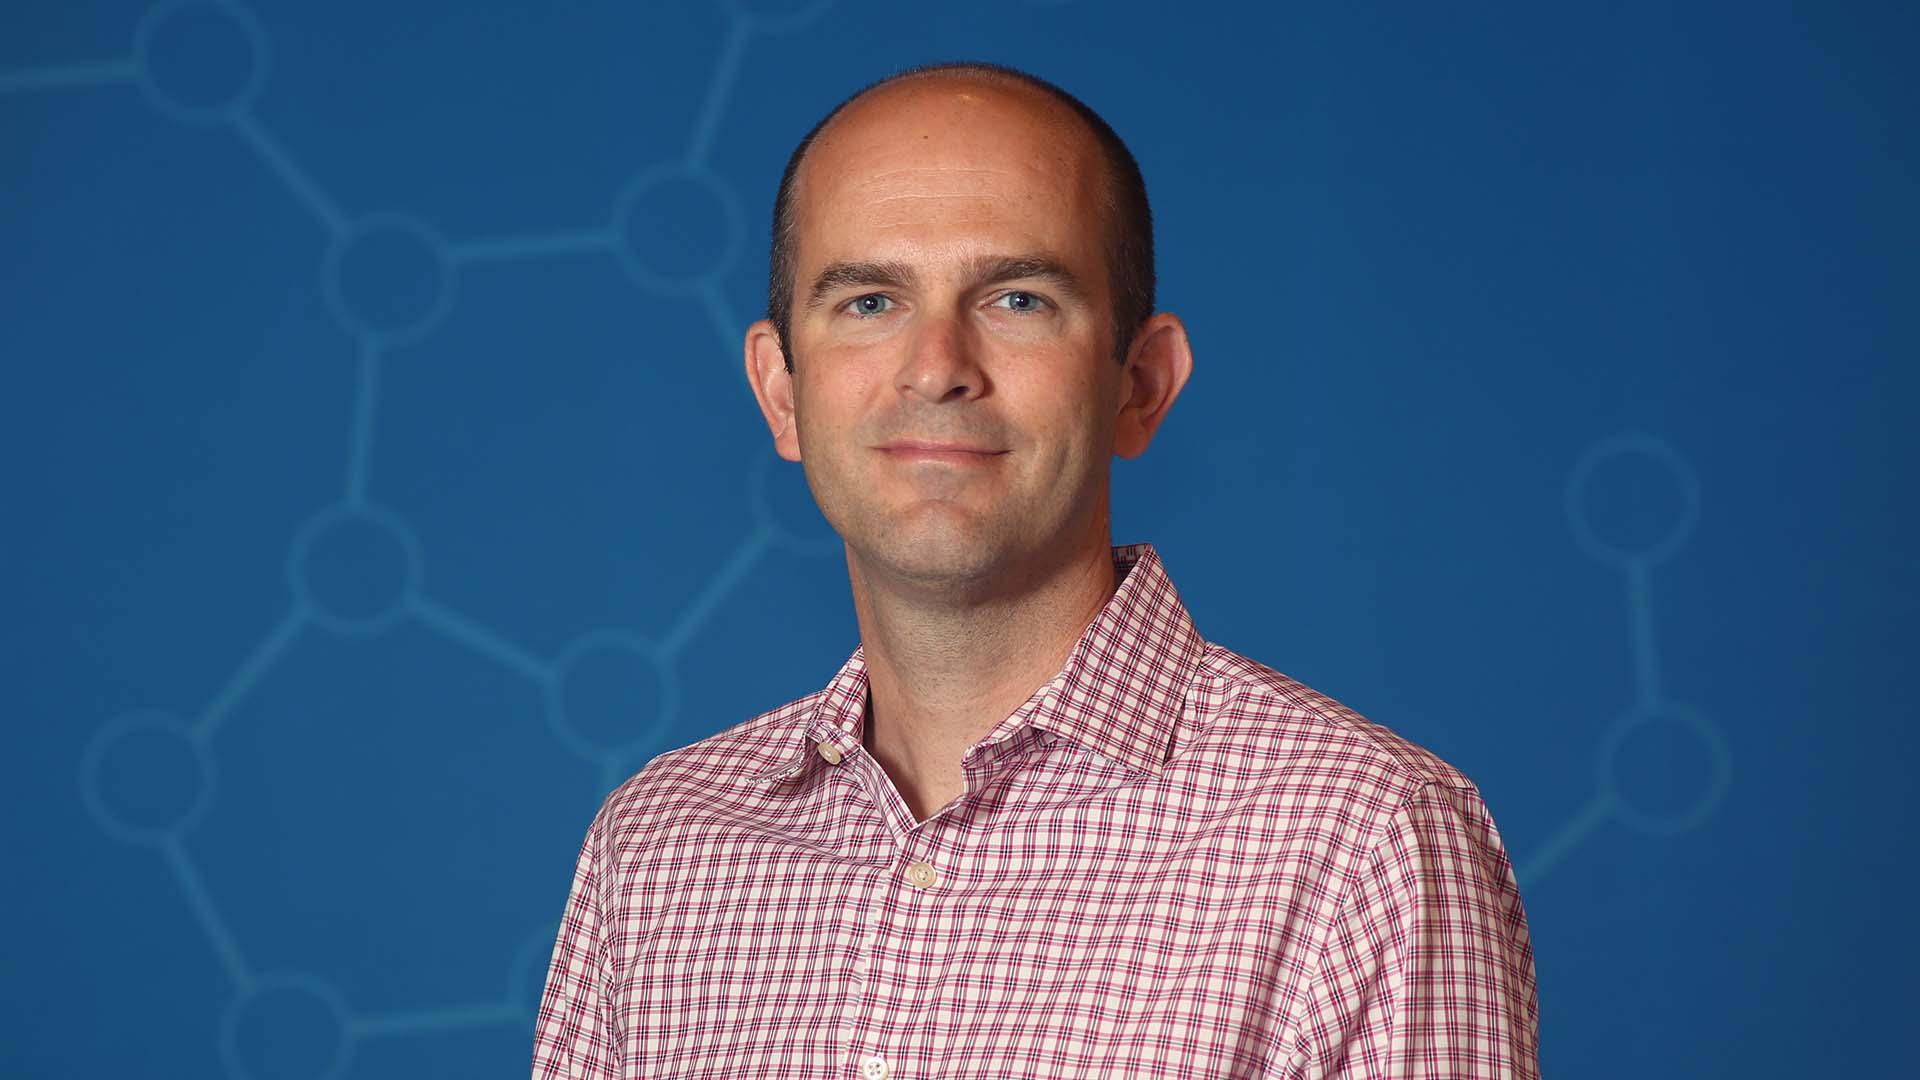 Chris Vakoc